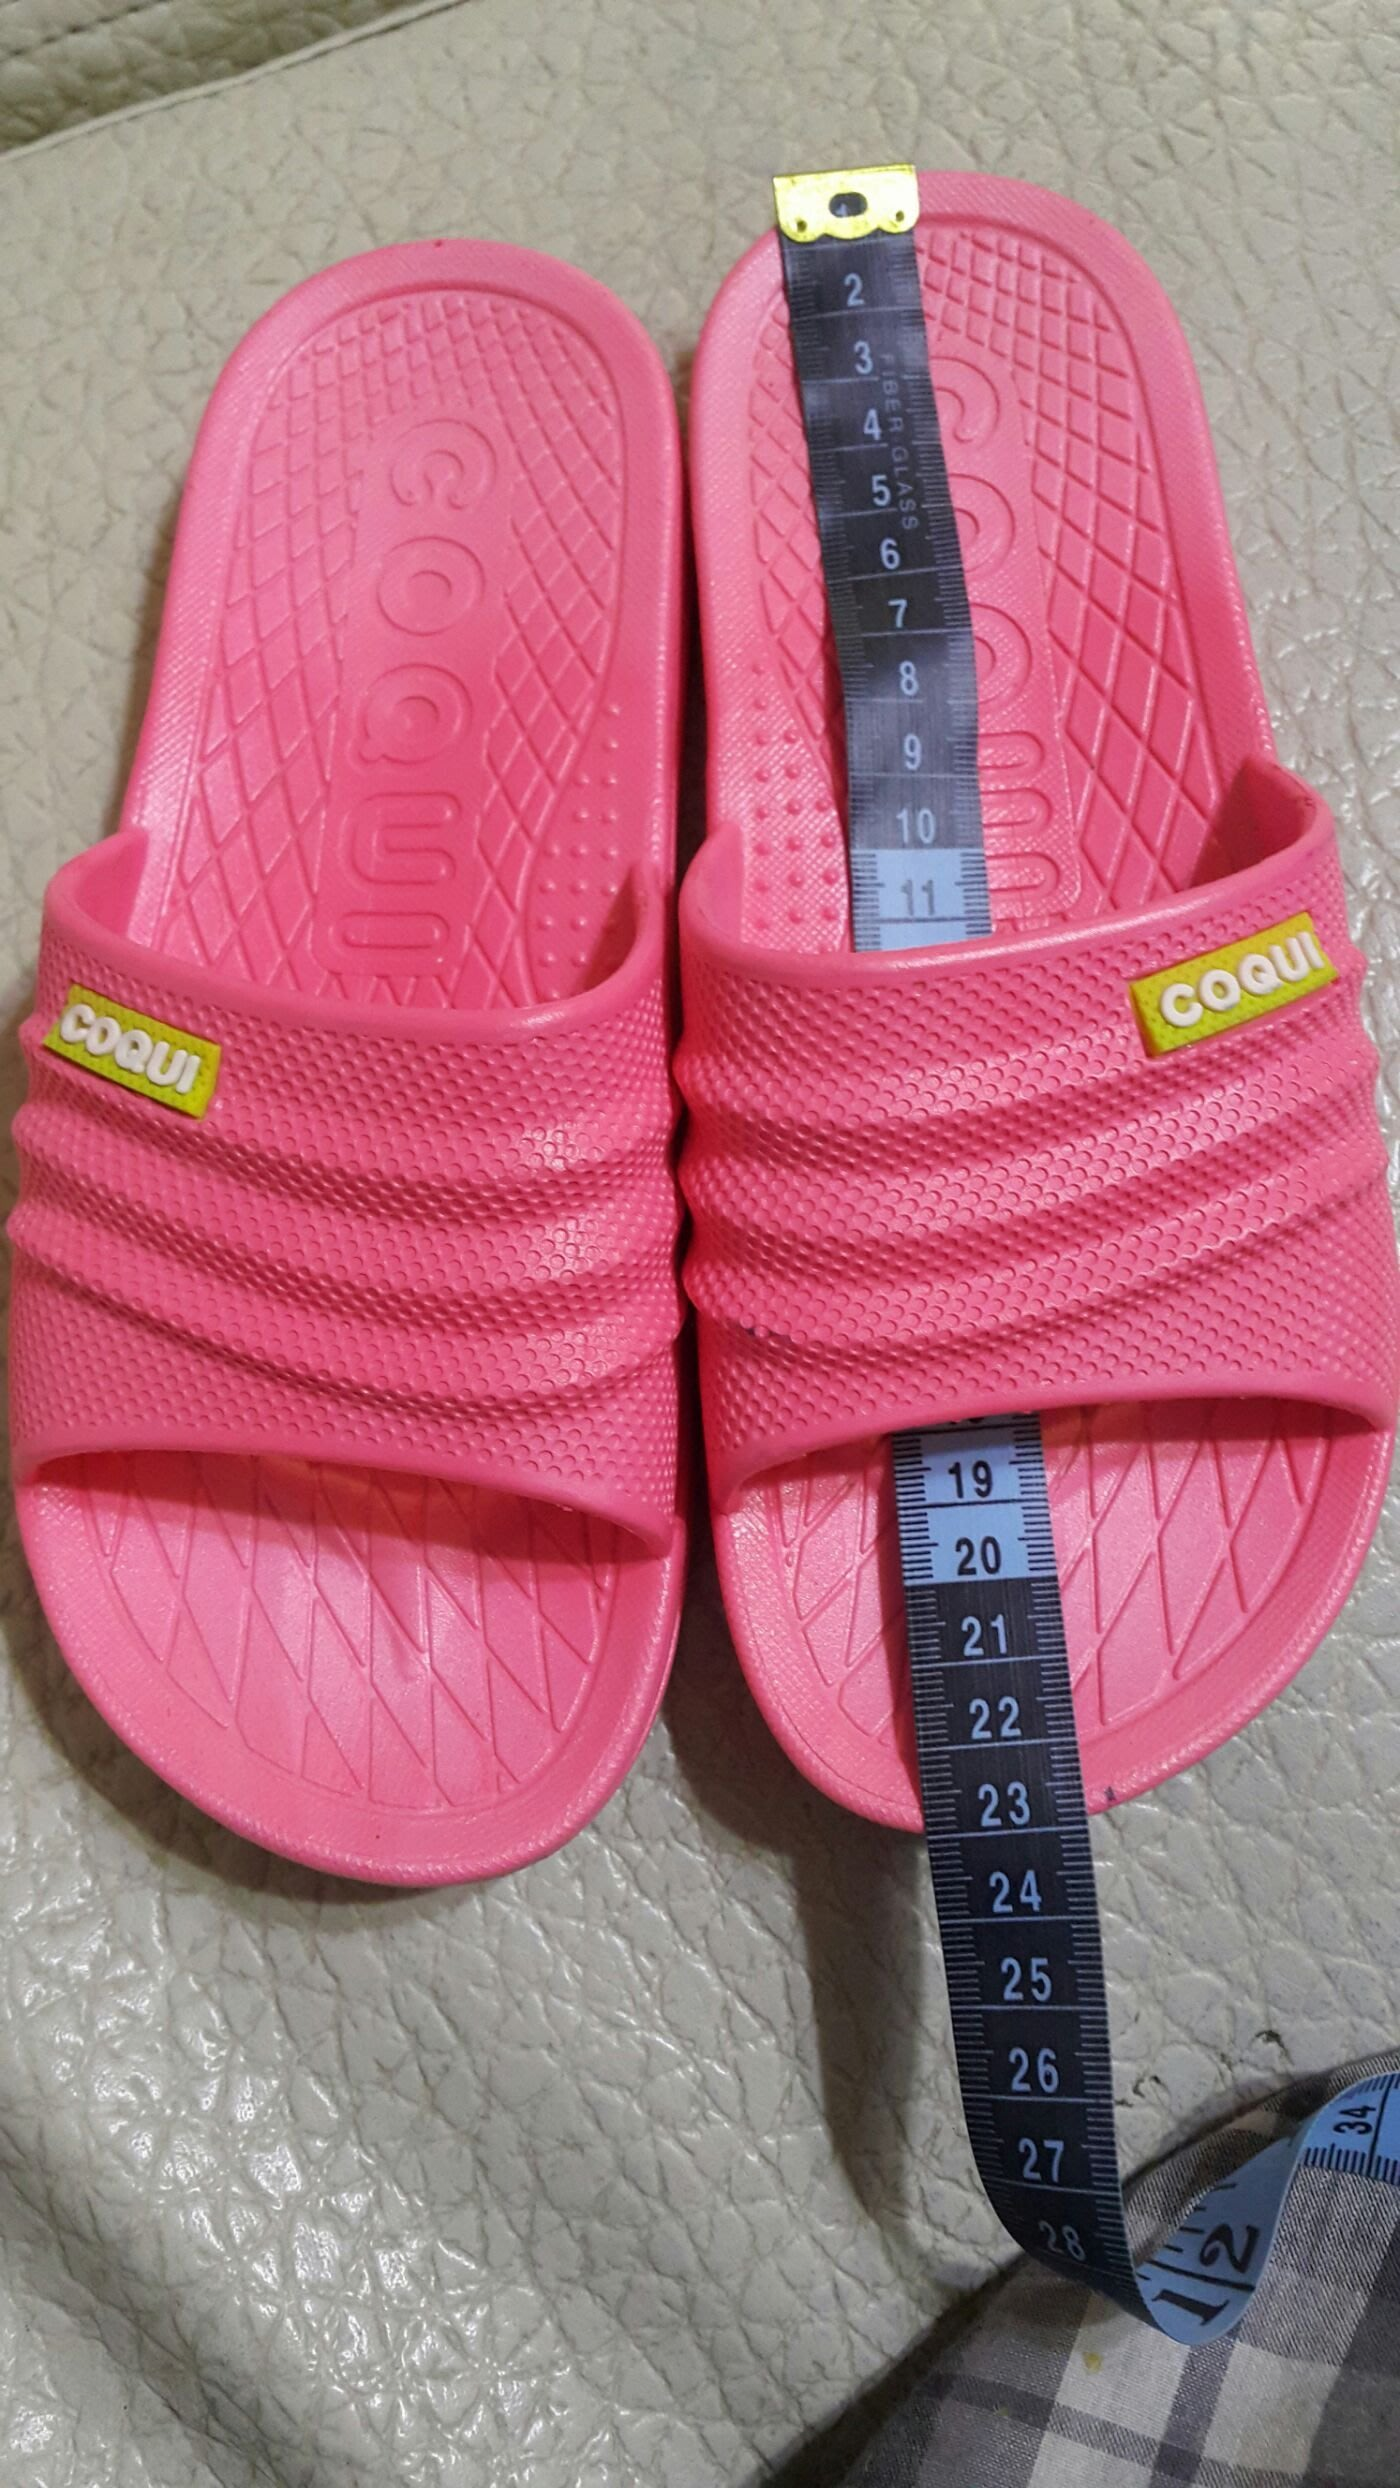 COQUi 酷趣 浴室 拖鞋  夏季家居家室內 塑料 涼拖鞋 海灘室外鞋(椅袋)